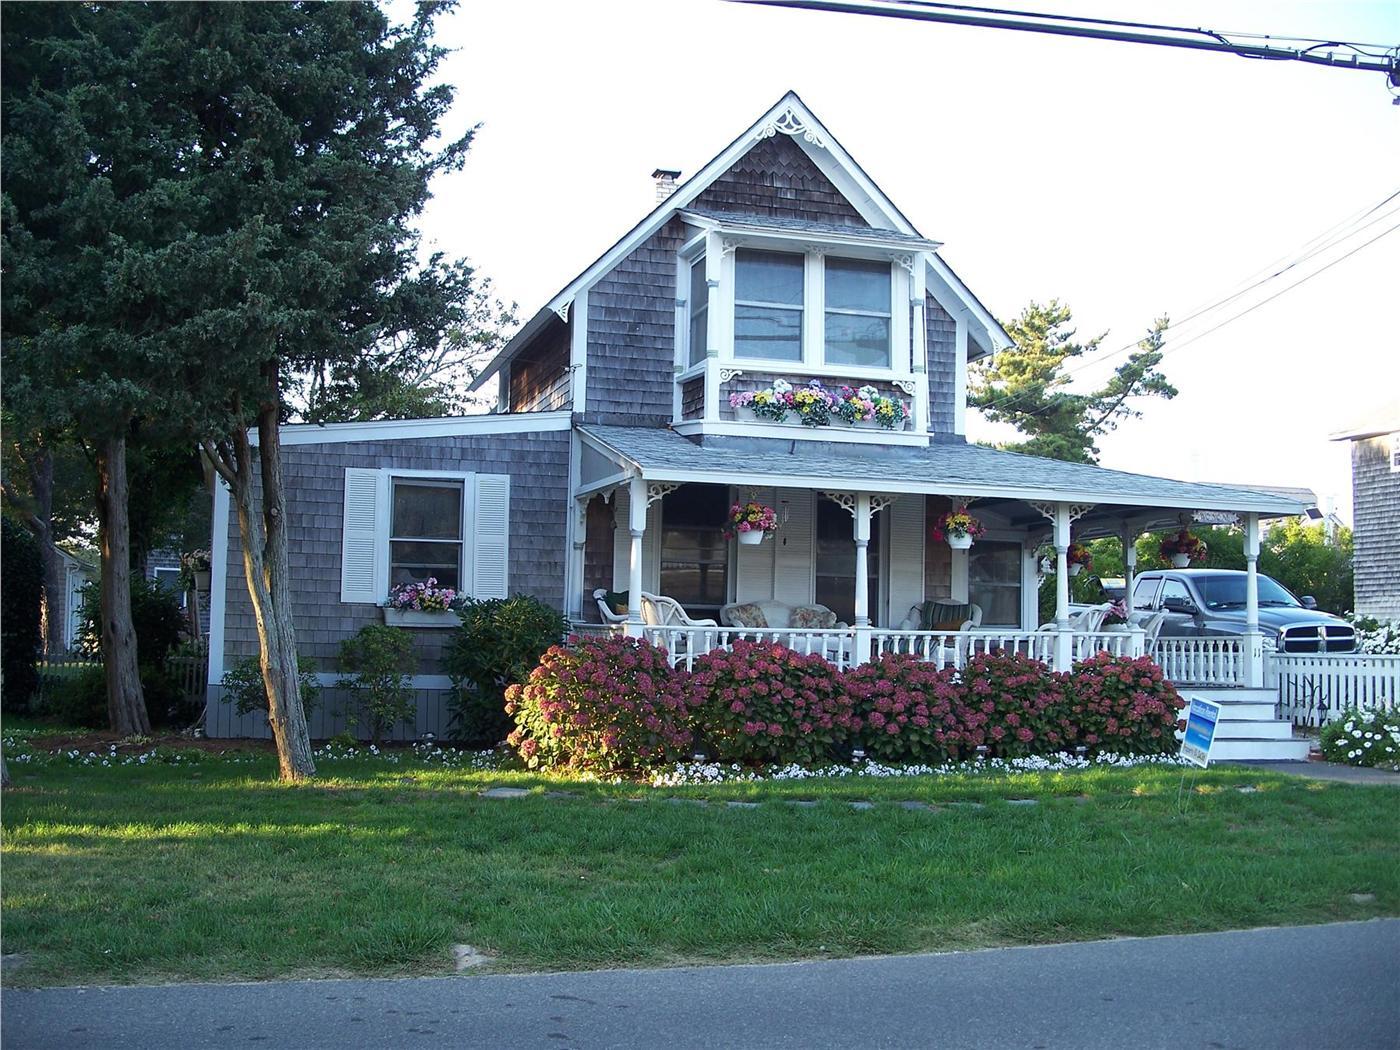 Oak Bluffs Vacation Rental Home In Martha S Vineyard Ma 02557 500 Feet To Inkwell Beach And